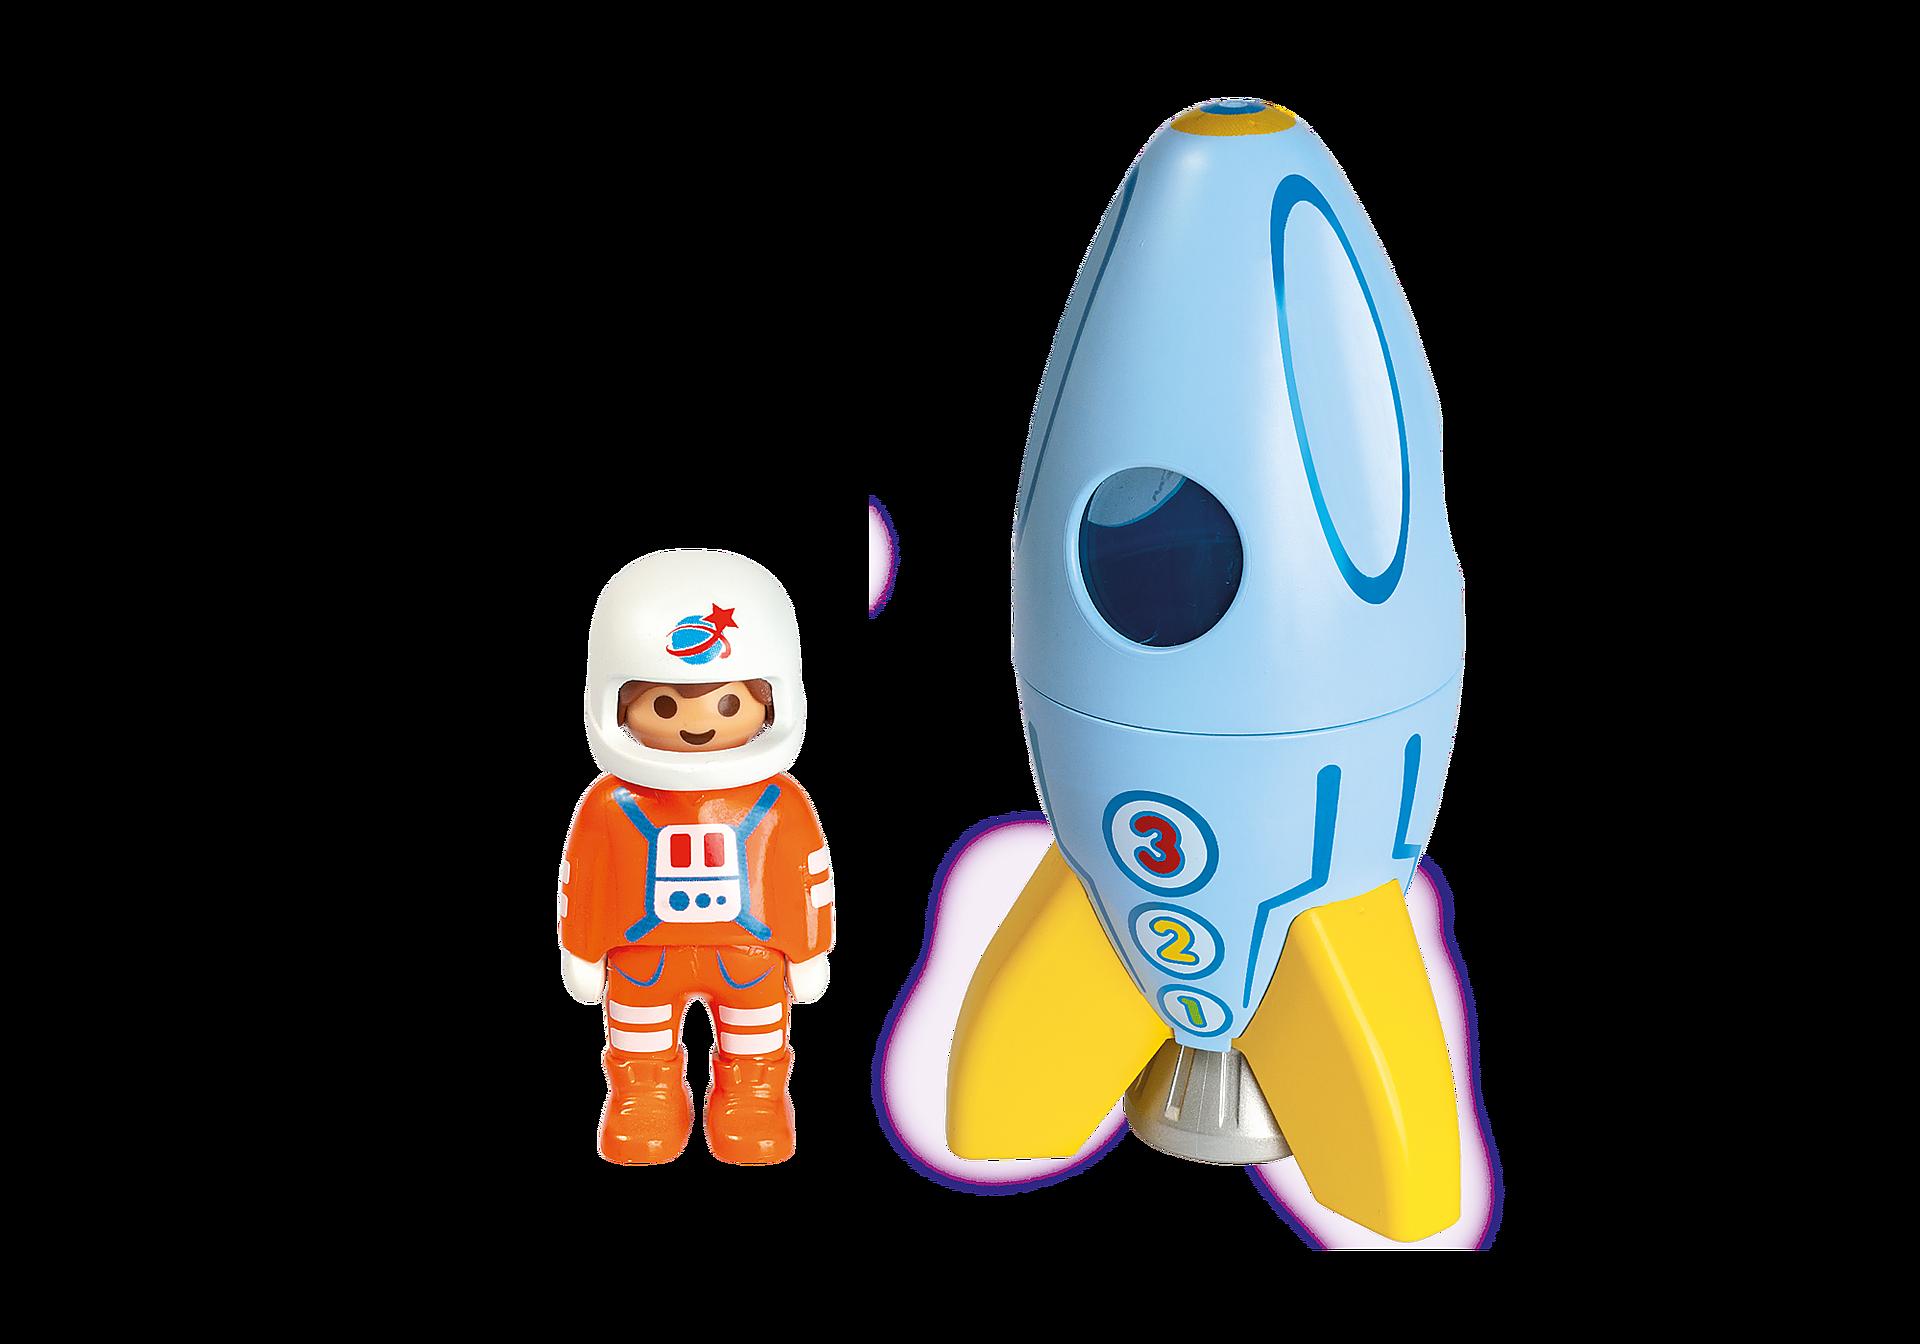 70186 1.2.3 Astronauta con Cohete zoom image3